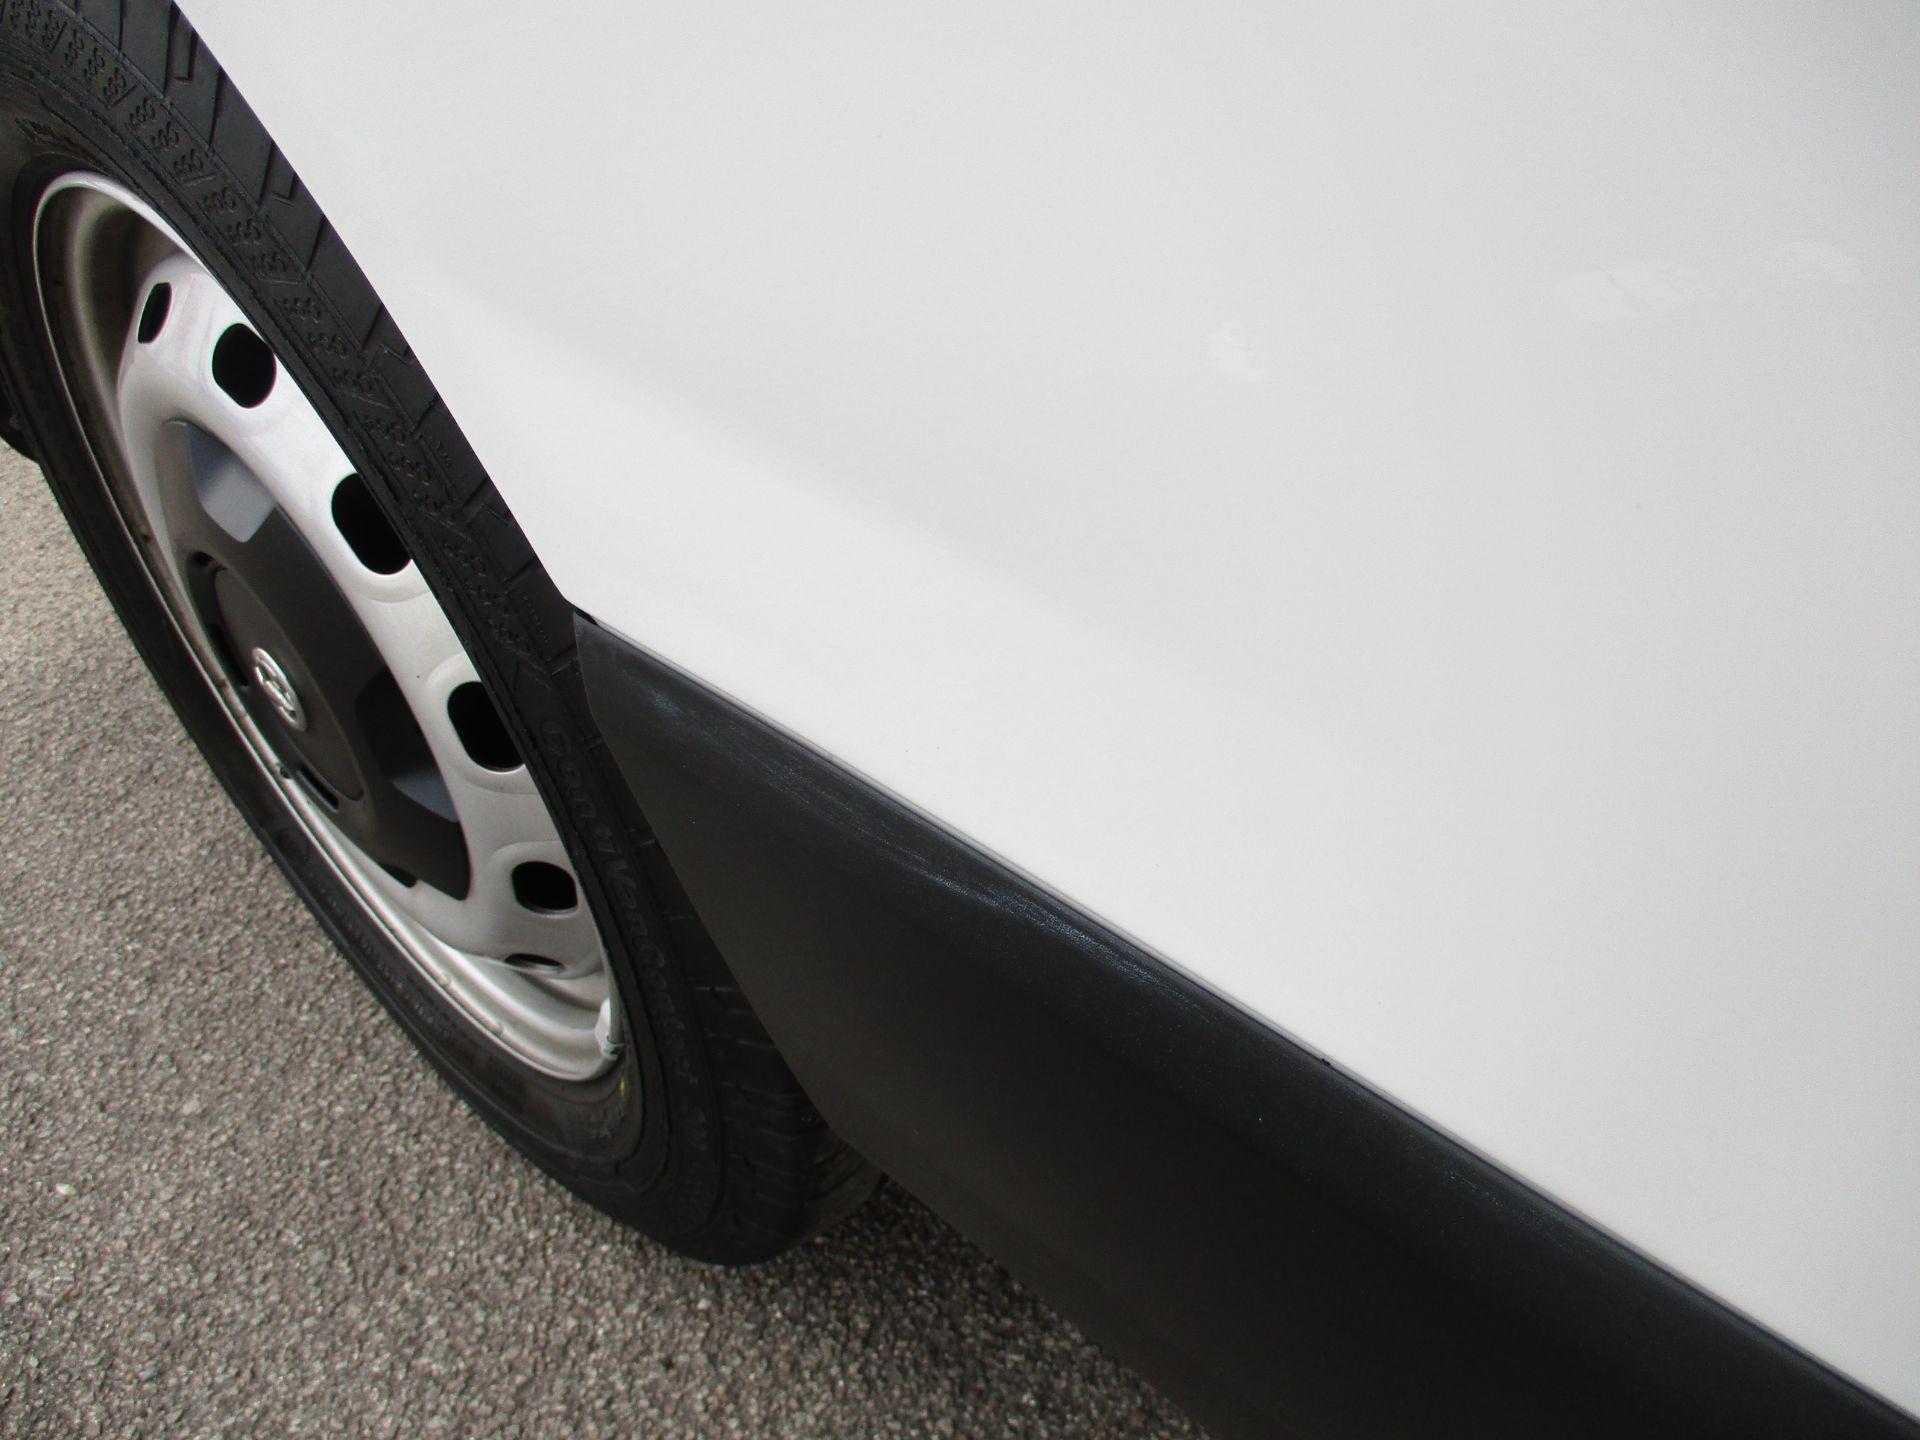 2017 Vauxhall Vivaro L2 H1 2900 1.6CDTI 120PS DOUBLE CAB  EURO 6 (DY67MYF) Image 26